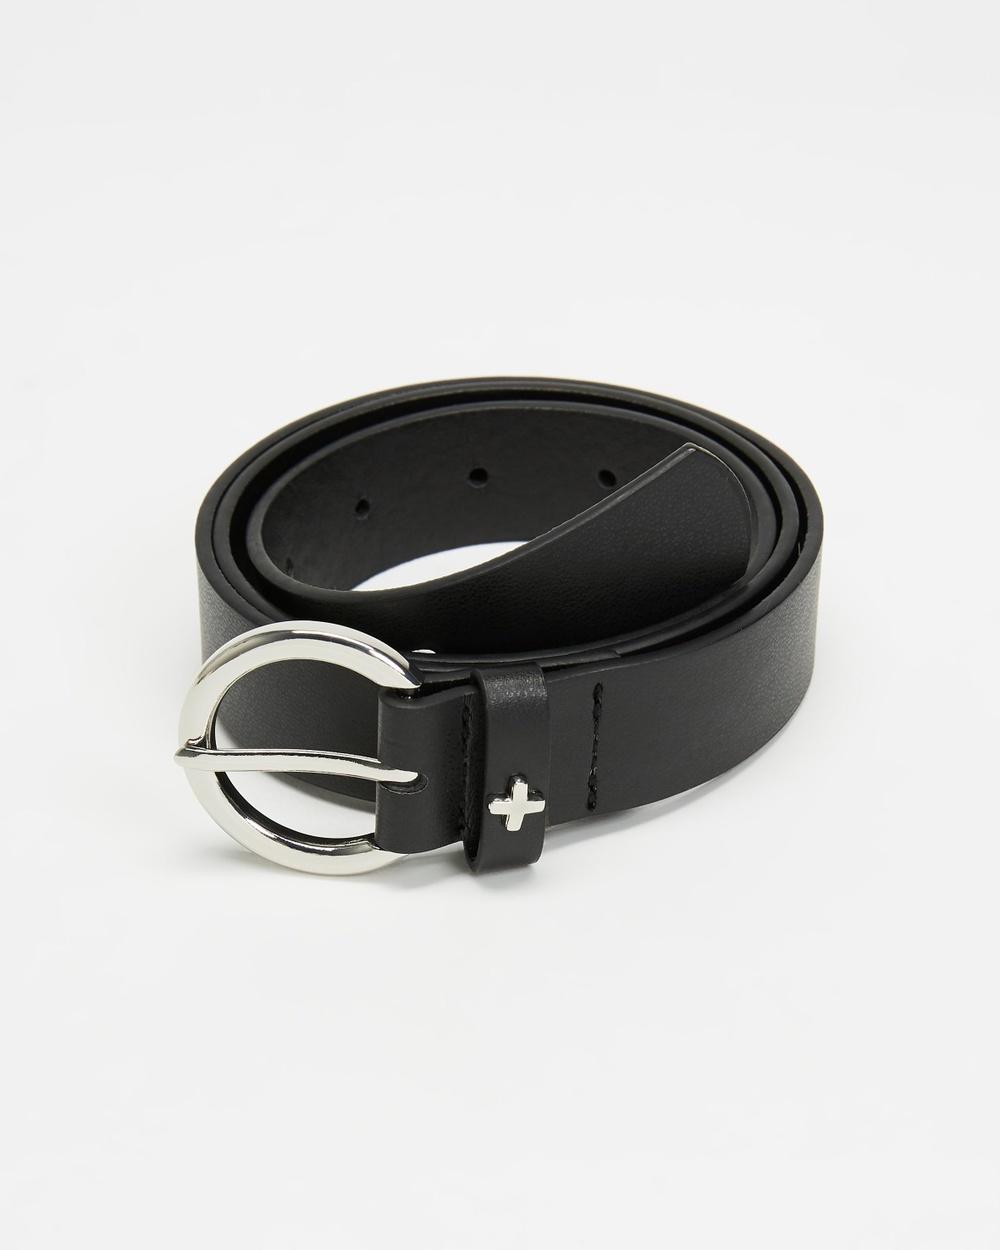 PETA AND JAIN Sinatra Belts Black & Silver